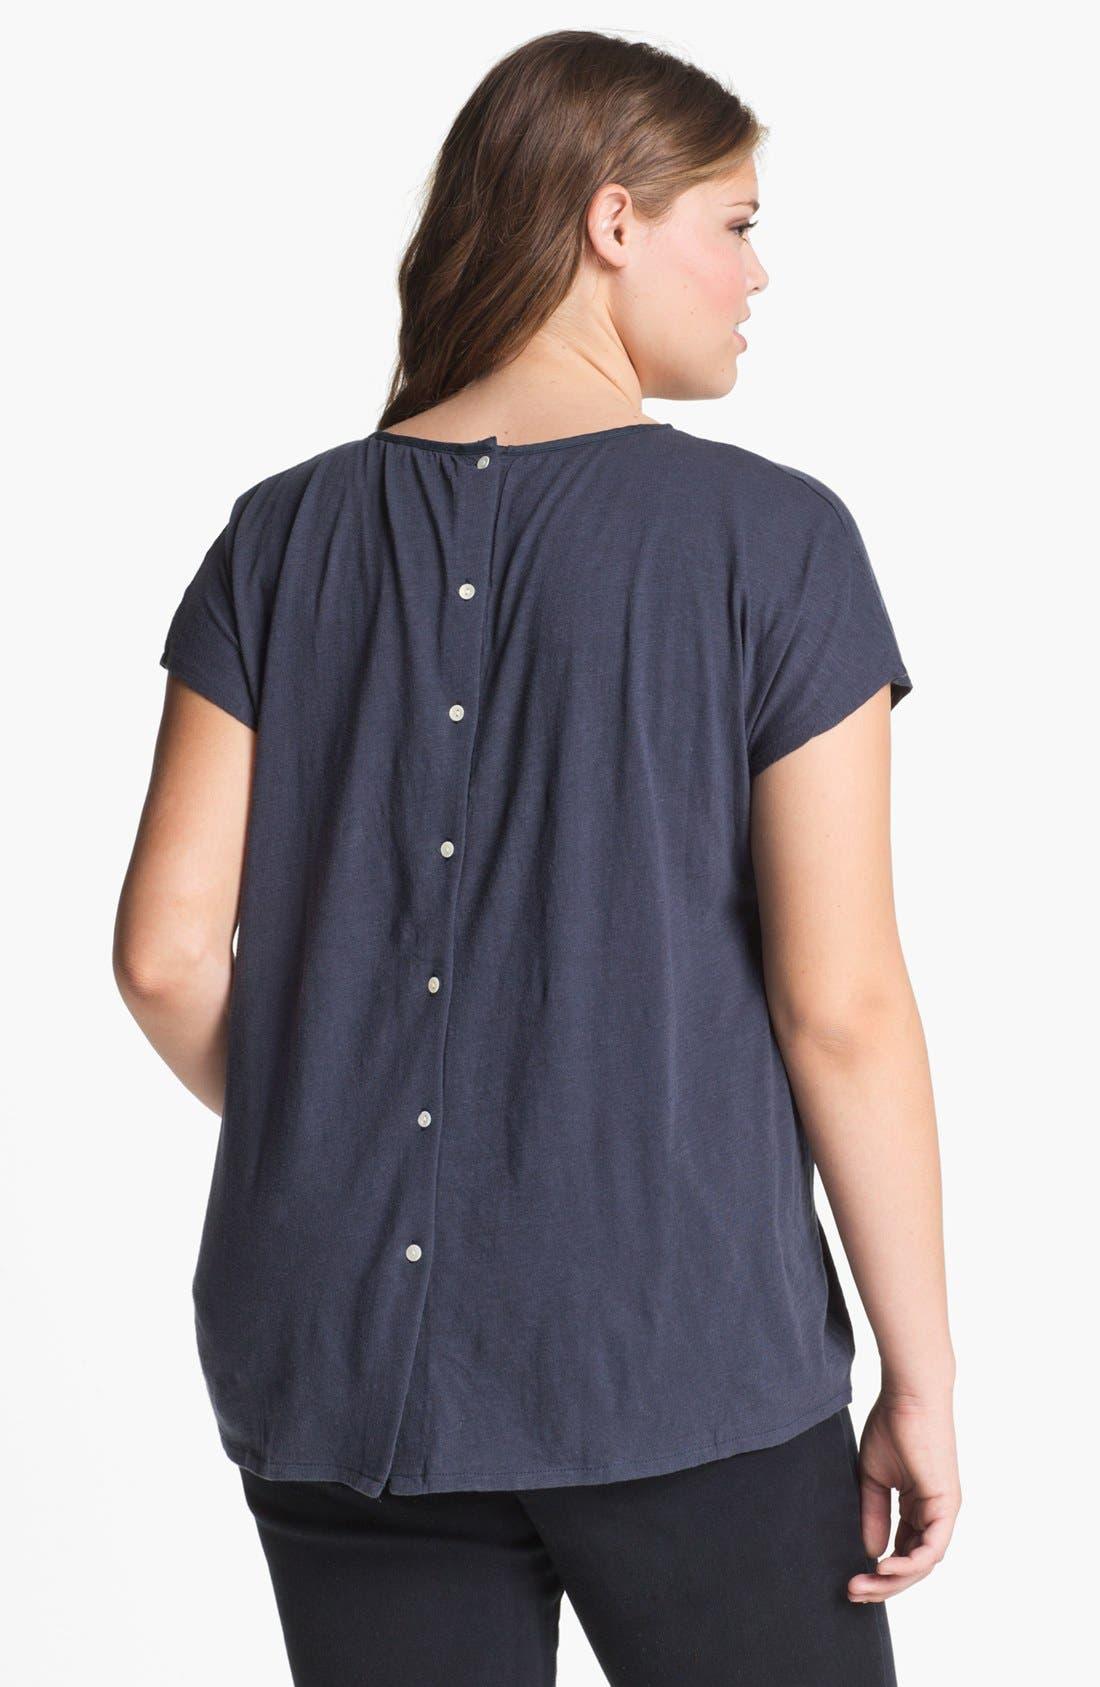 Alternate Image 2  - Lucky Brand 'Lillian' Button Back Tee (Plus)